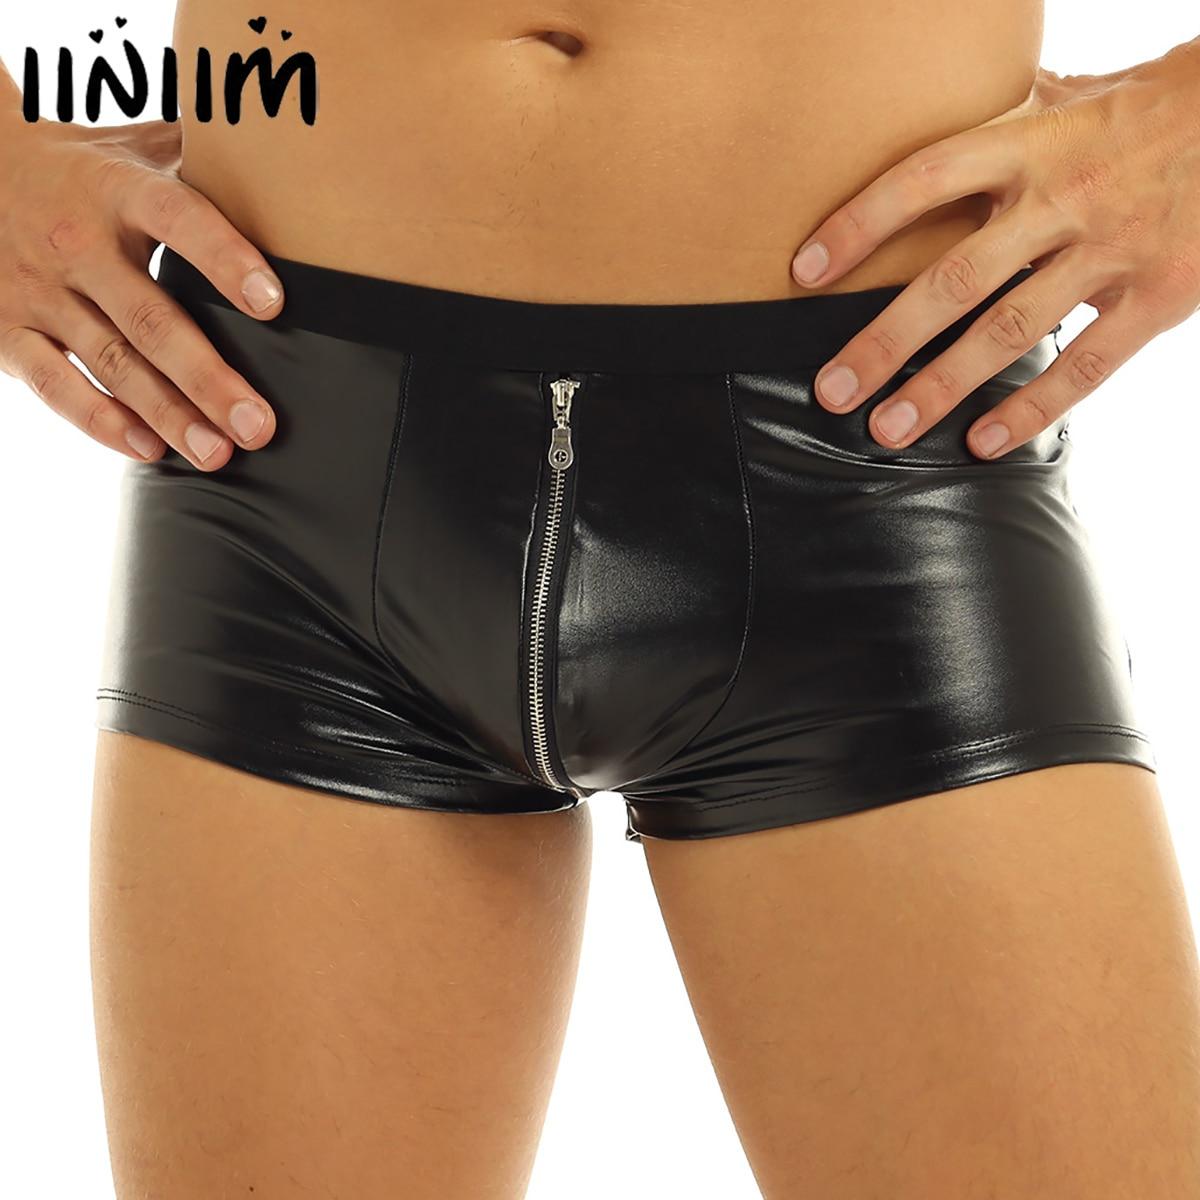 Iiniim Mens Sexy Lingerie Panties Faux Leather Zipper Jockstraps Bulge Pouch Gay Sexy Clubwear Boxer Shorts Underwear Underpants